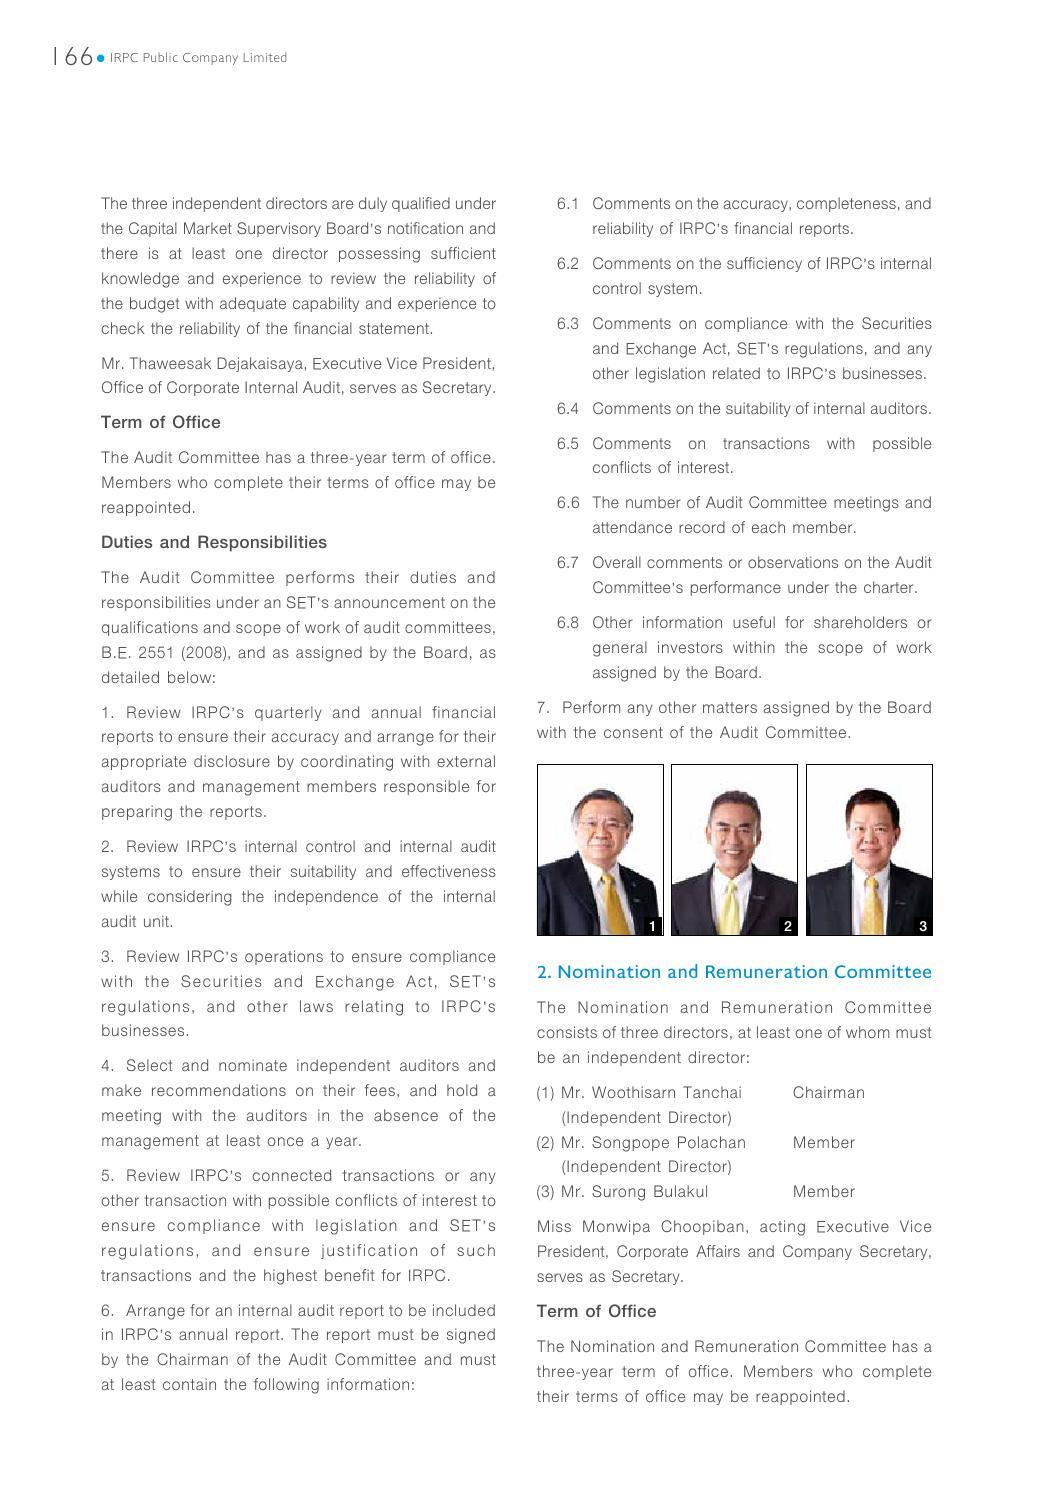 IRPC: Annual Report 2014 by orapan shareinvestor - issuu